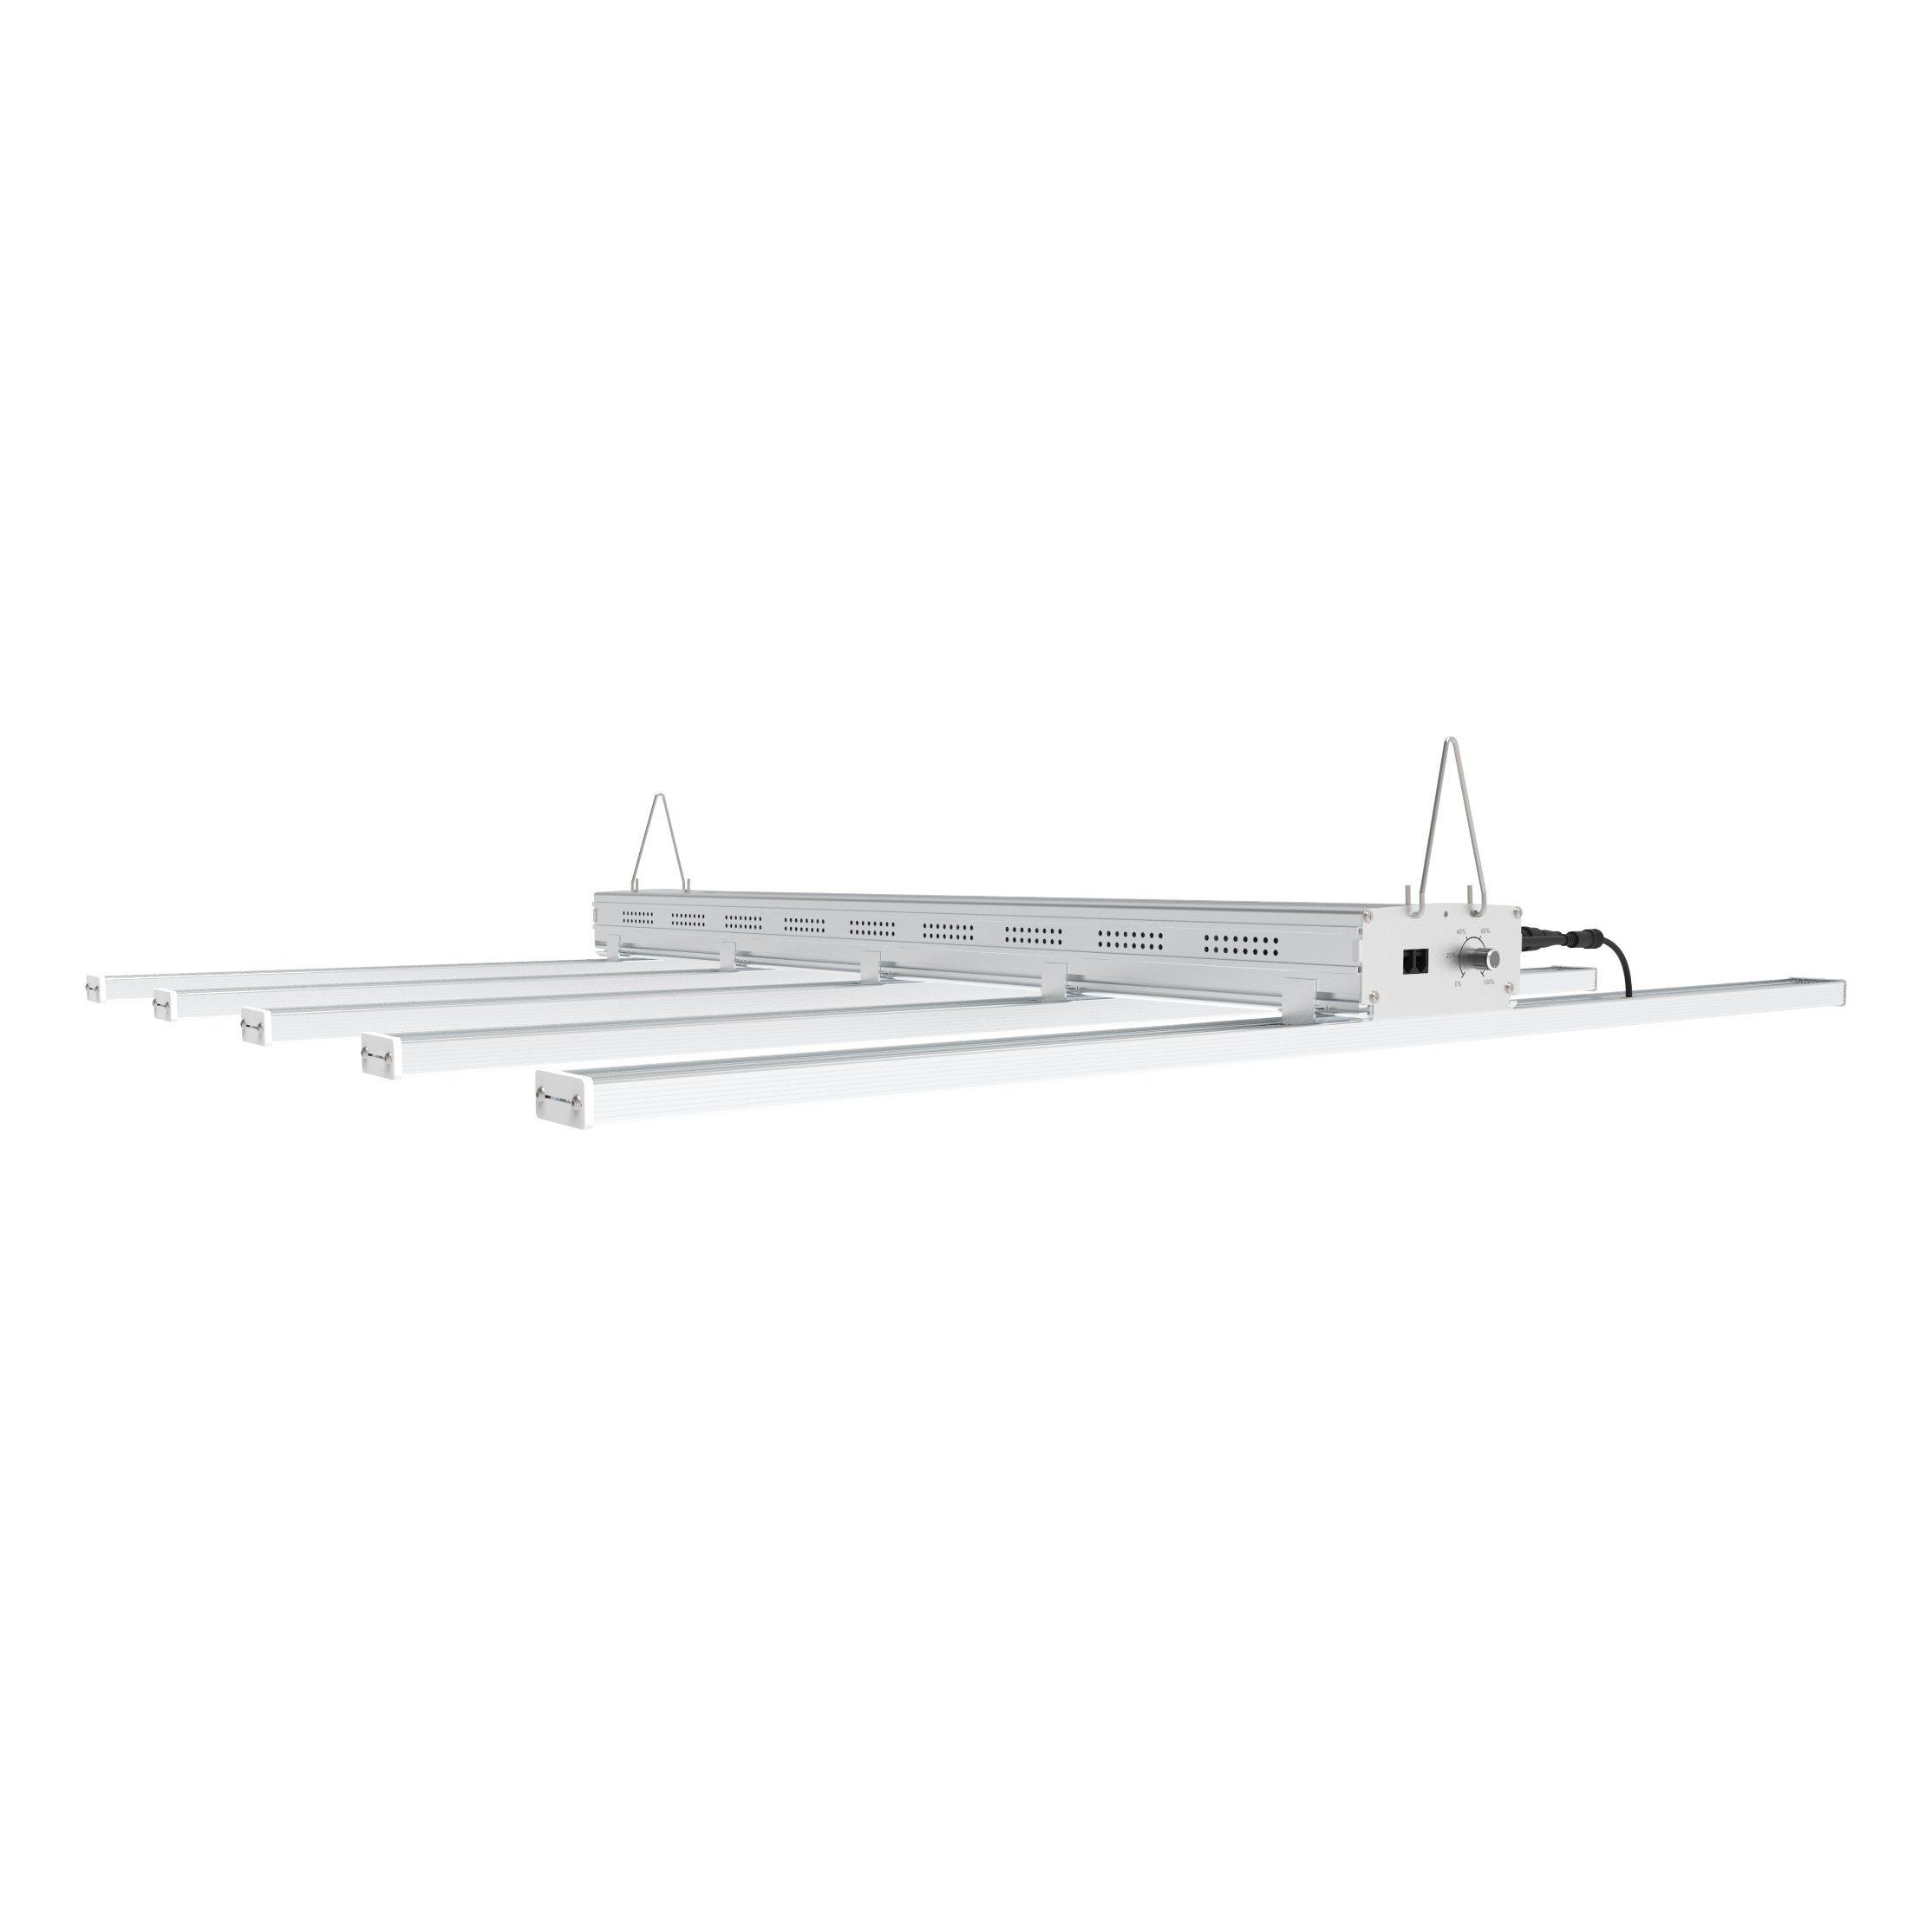 800W-400W Dimmable LED Grow Light Full Spectrum 660nm High PPFD VS Fluence Spydr